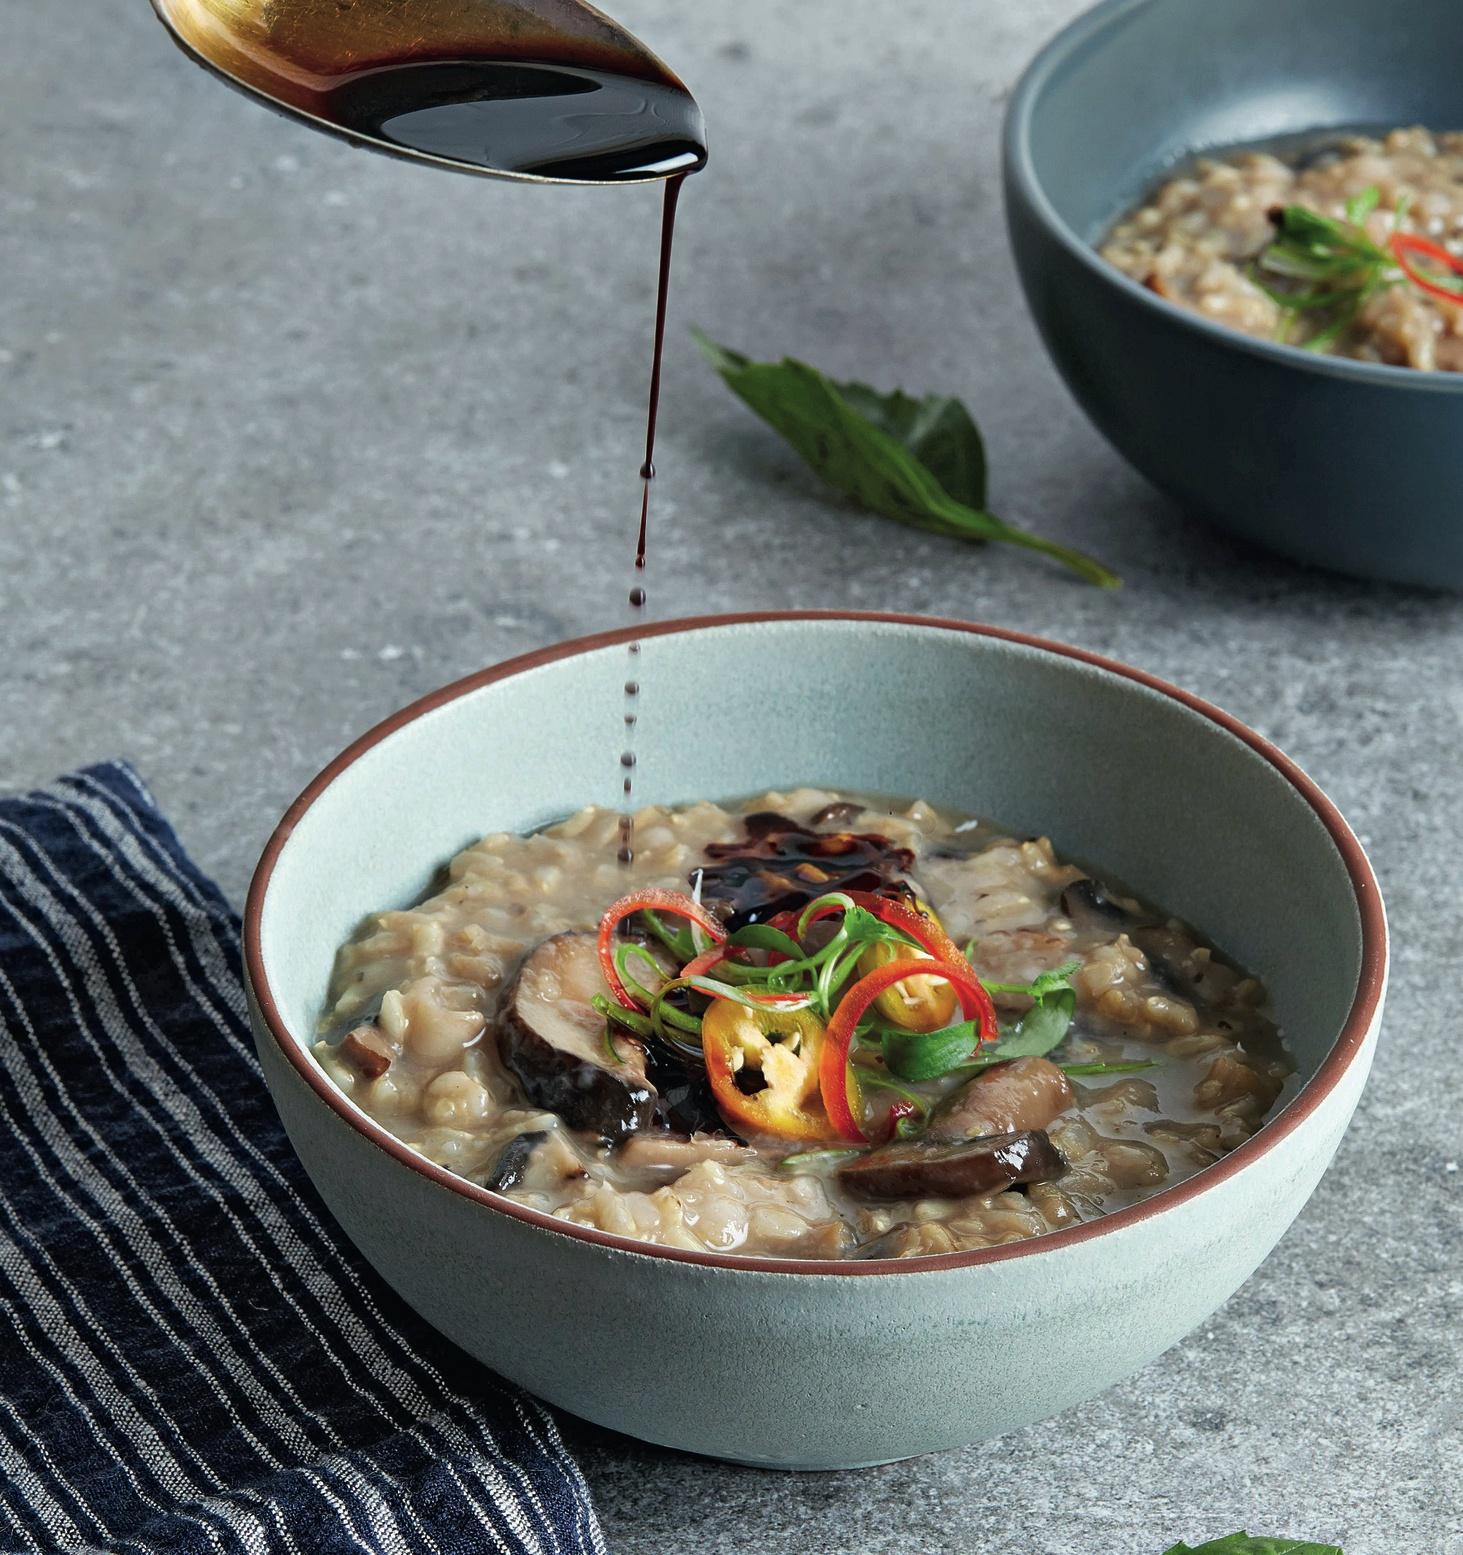 Slow Cooker Shiitake Congee (Rice Porridge)